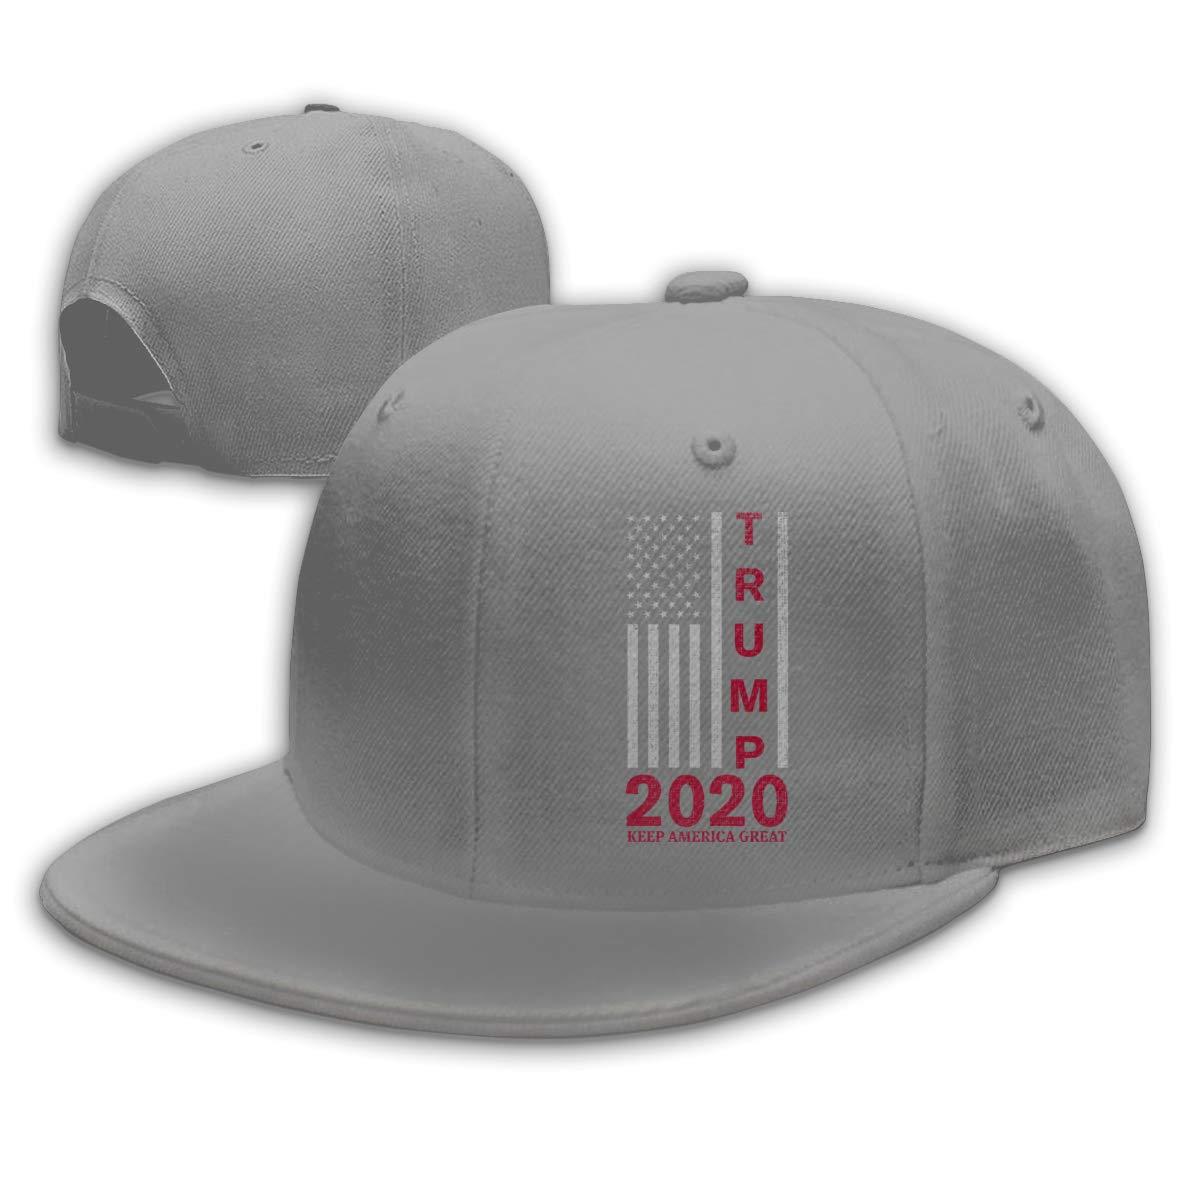 Trump 2020 Keep America Great Unisex Snapback Adjustable Flat Bill Baseball Cap (One Size, Trump 2020 Keep America Great(Grey))